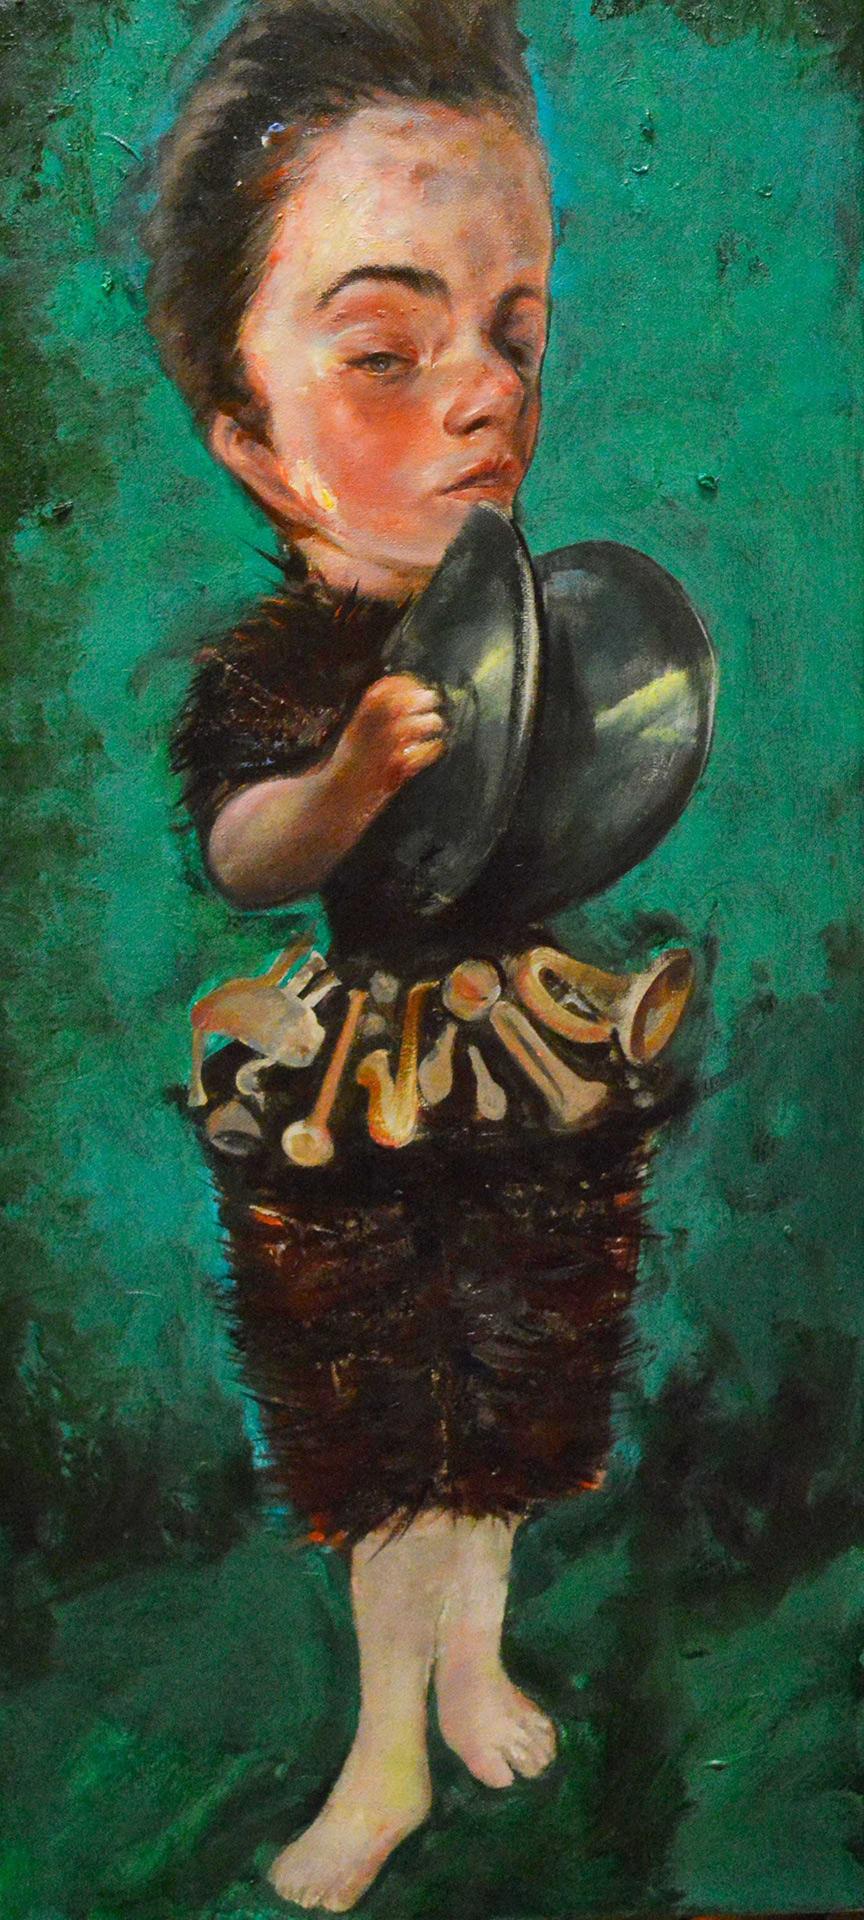 Theofilos Katsipanos, Untitled, 2020, Acrylics and oil on canvas, 70X30 cm